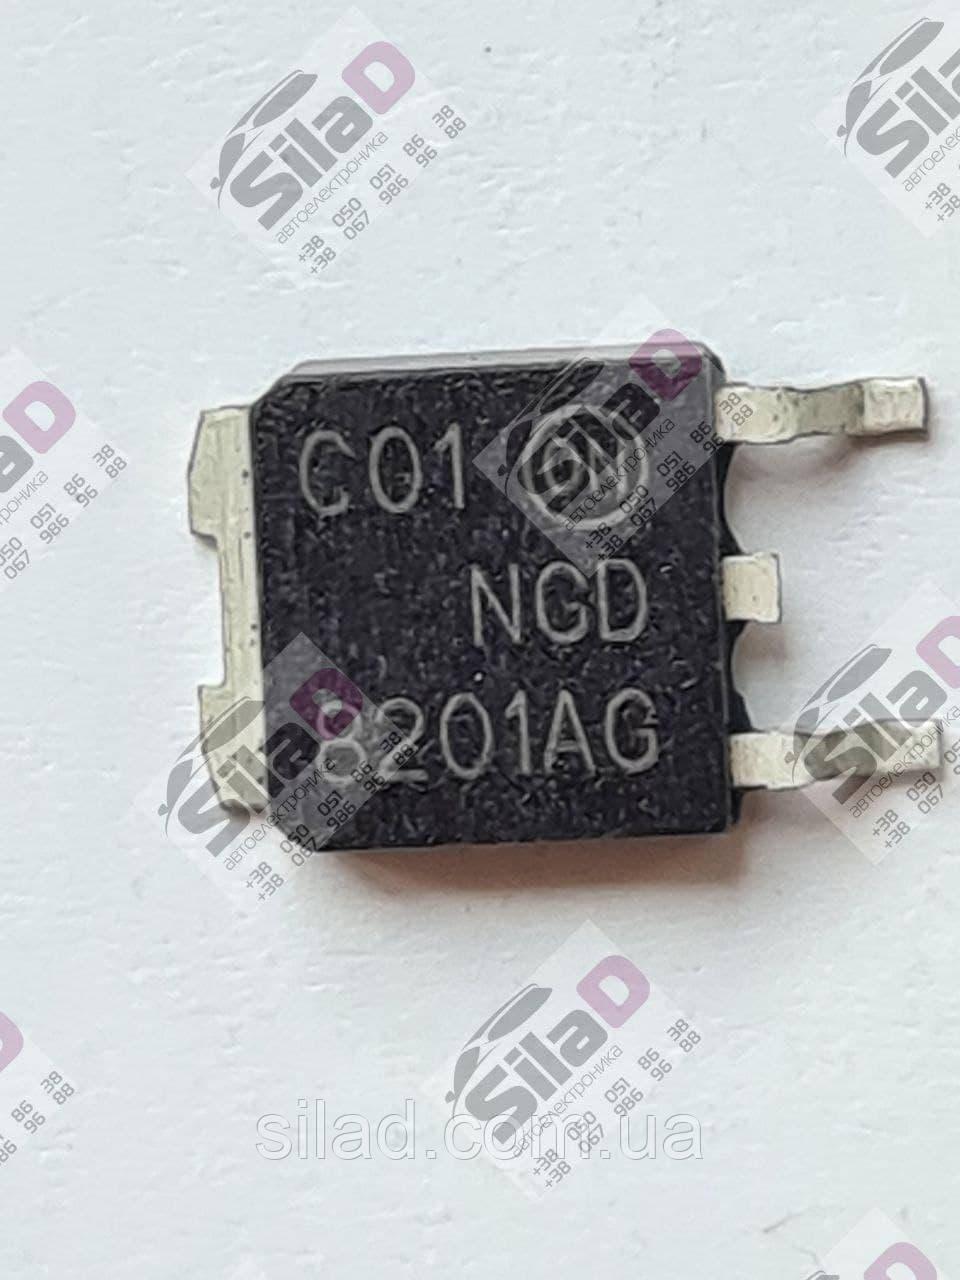 Транзистор NGD8201AG ON Semiconductor корпус DPAK